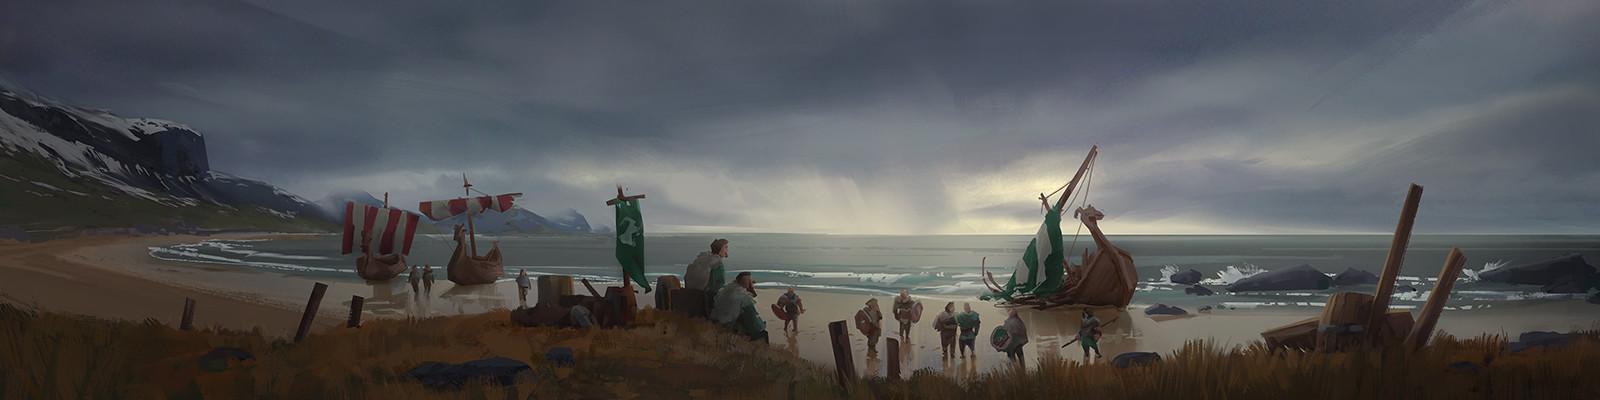 Northgard Concept Art by Etienne Hebinger